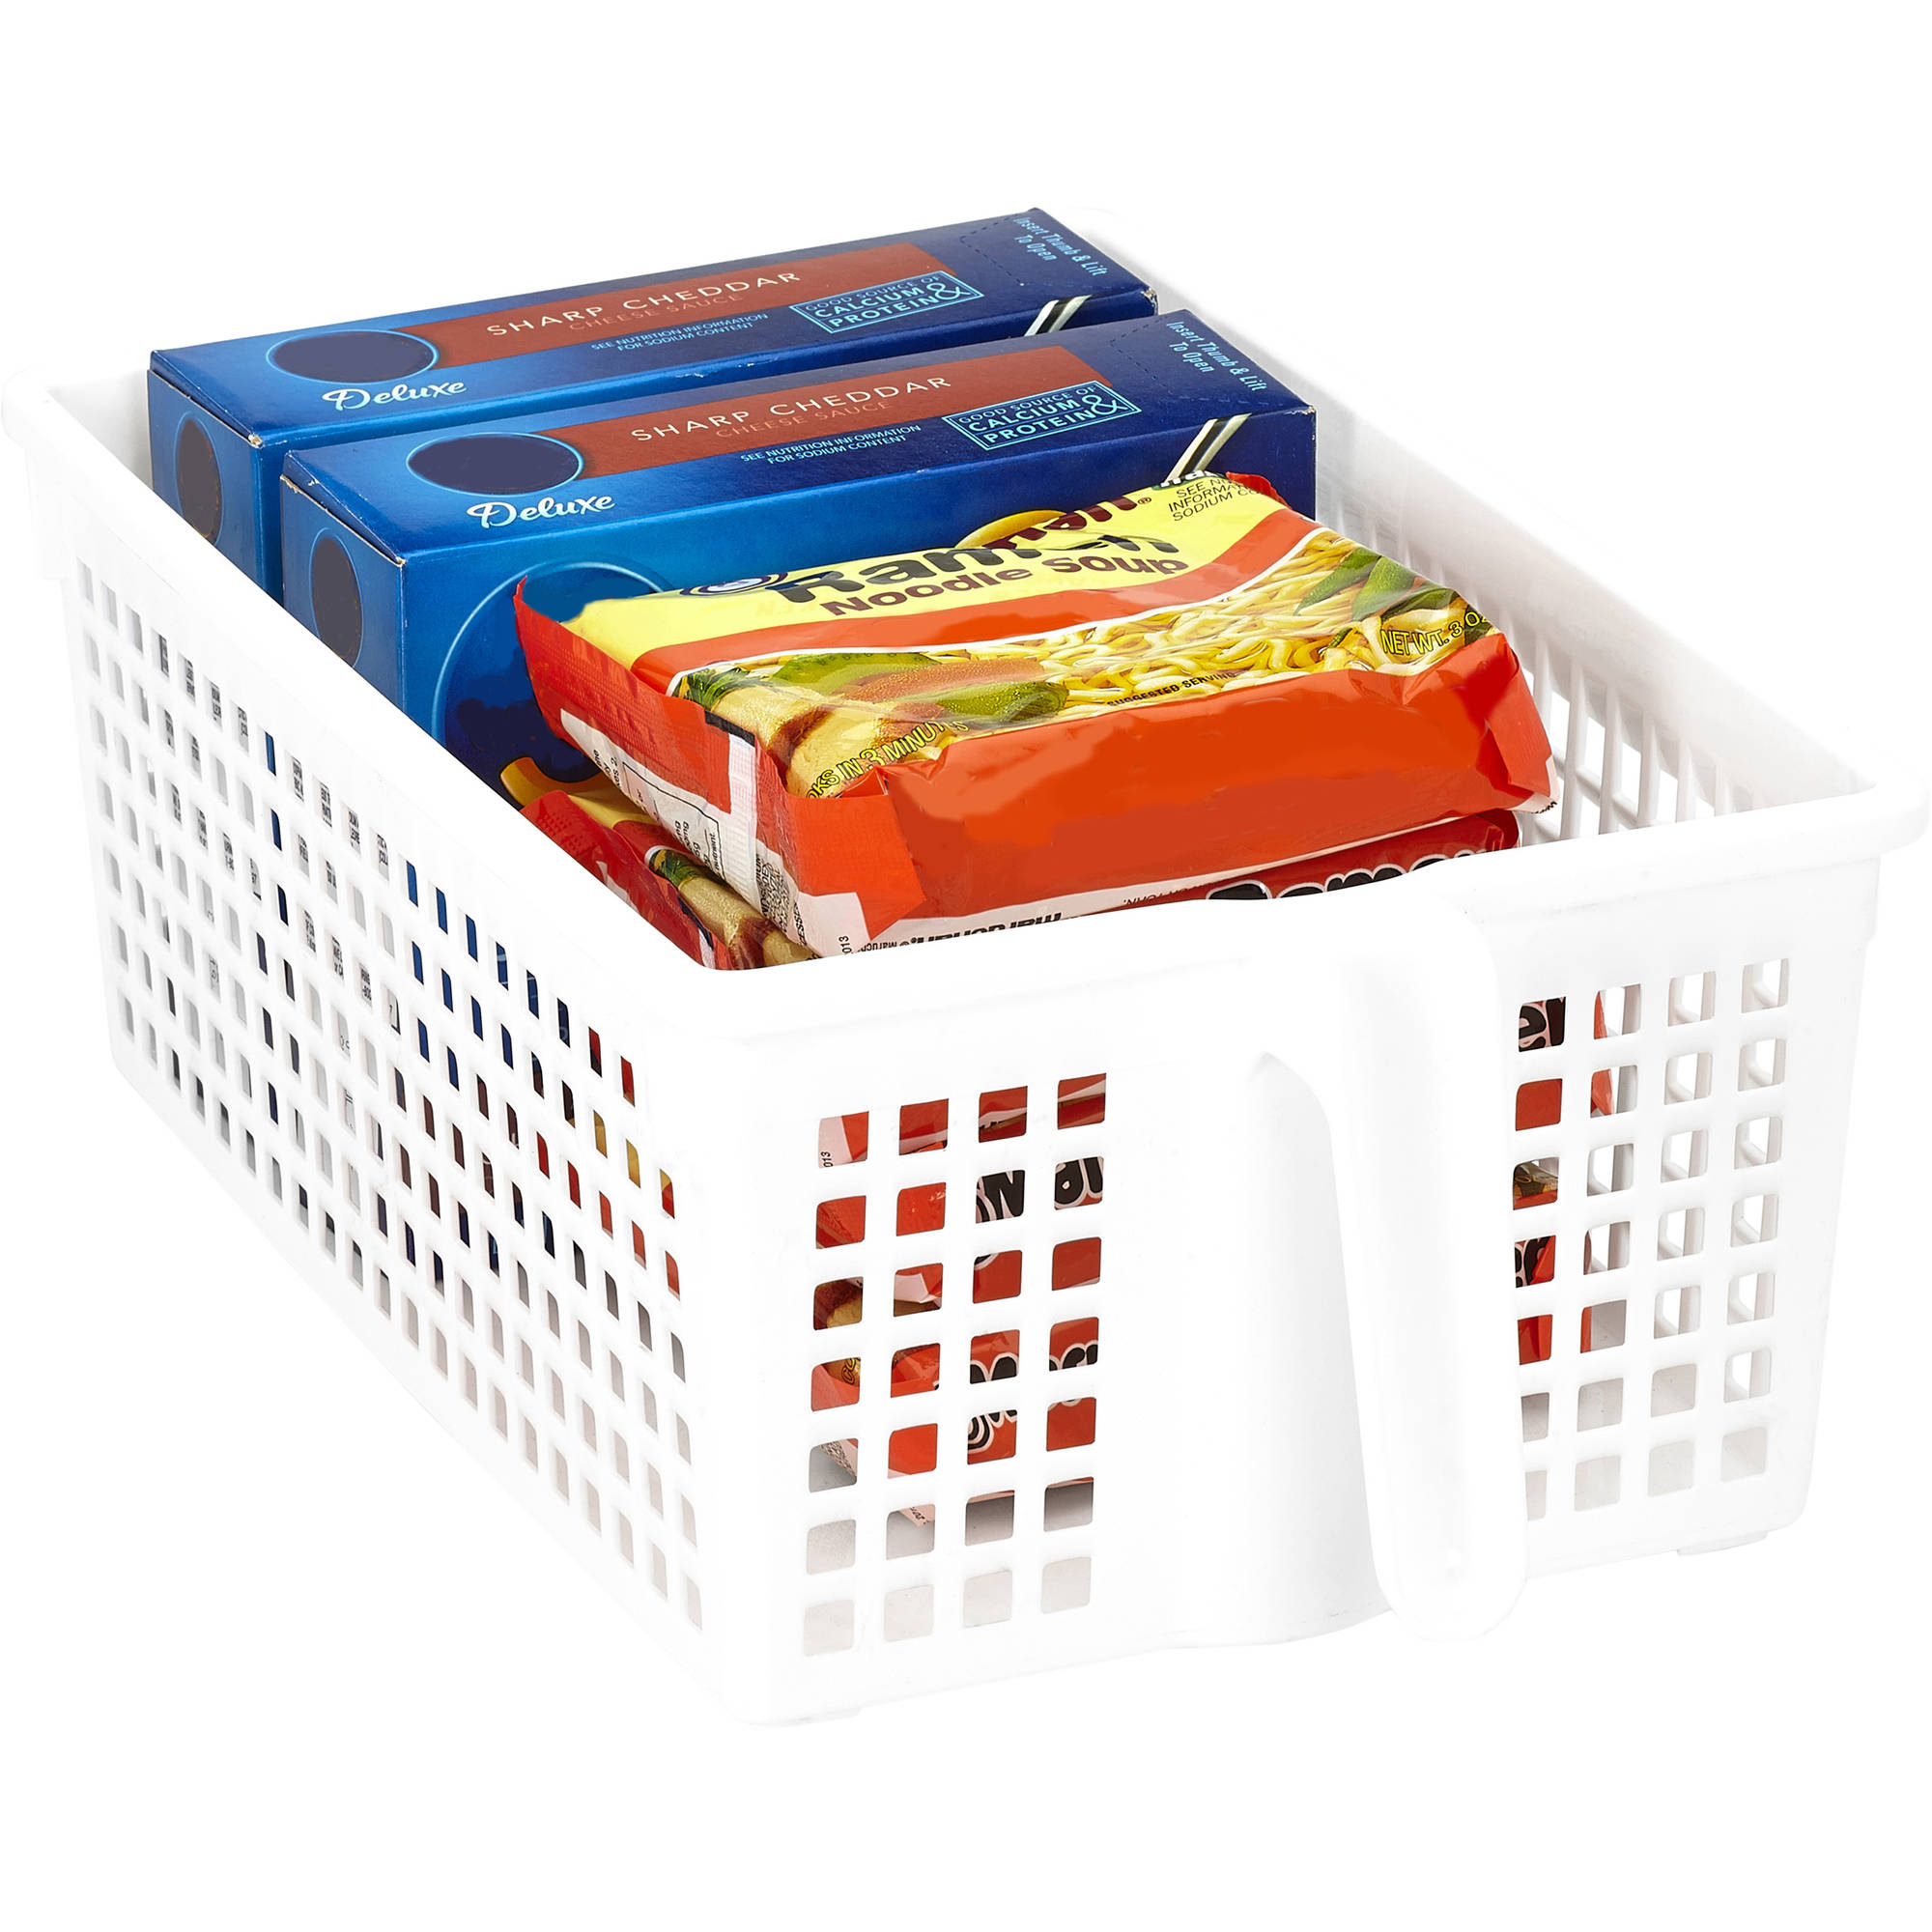 Kitchen Details Easy Pull Pantry Organizer Basket with Handle Grip, Medium